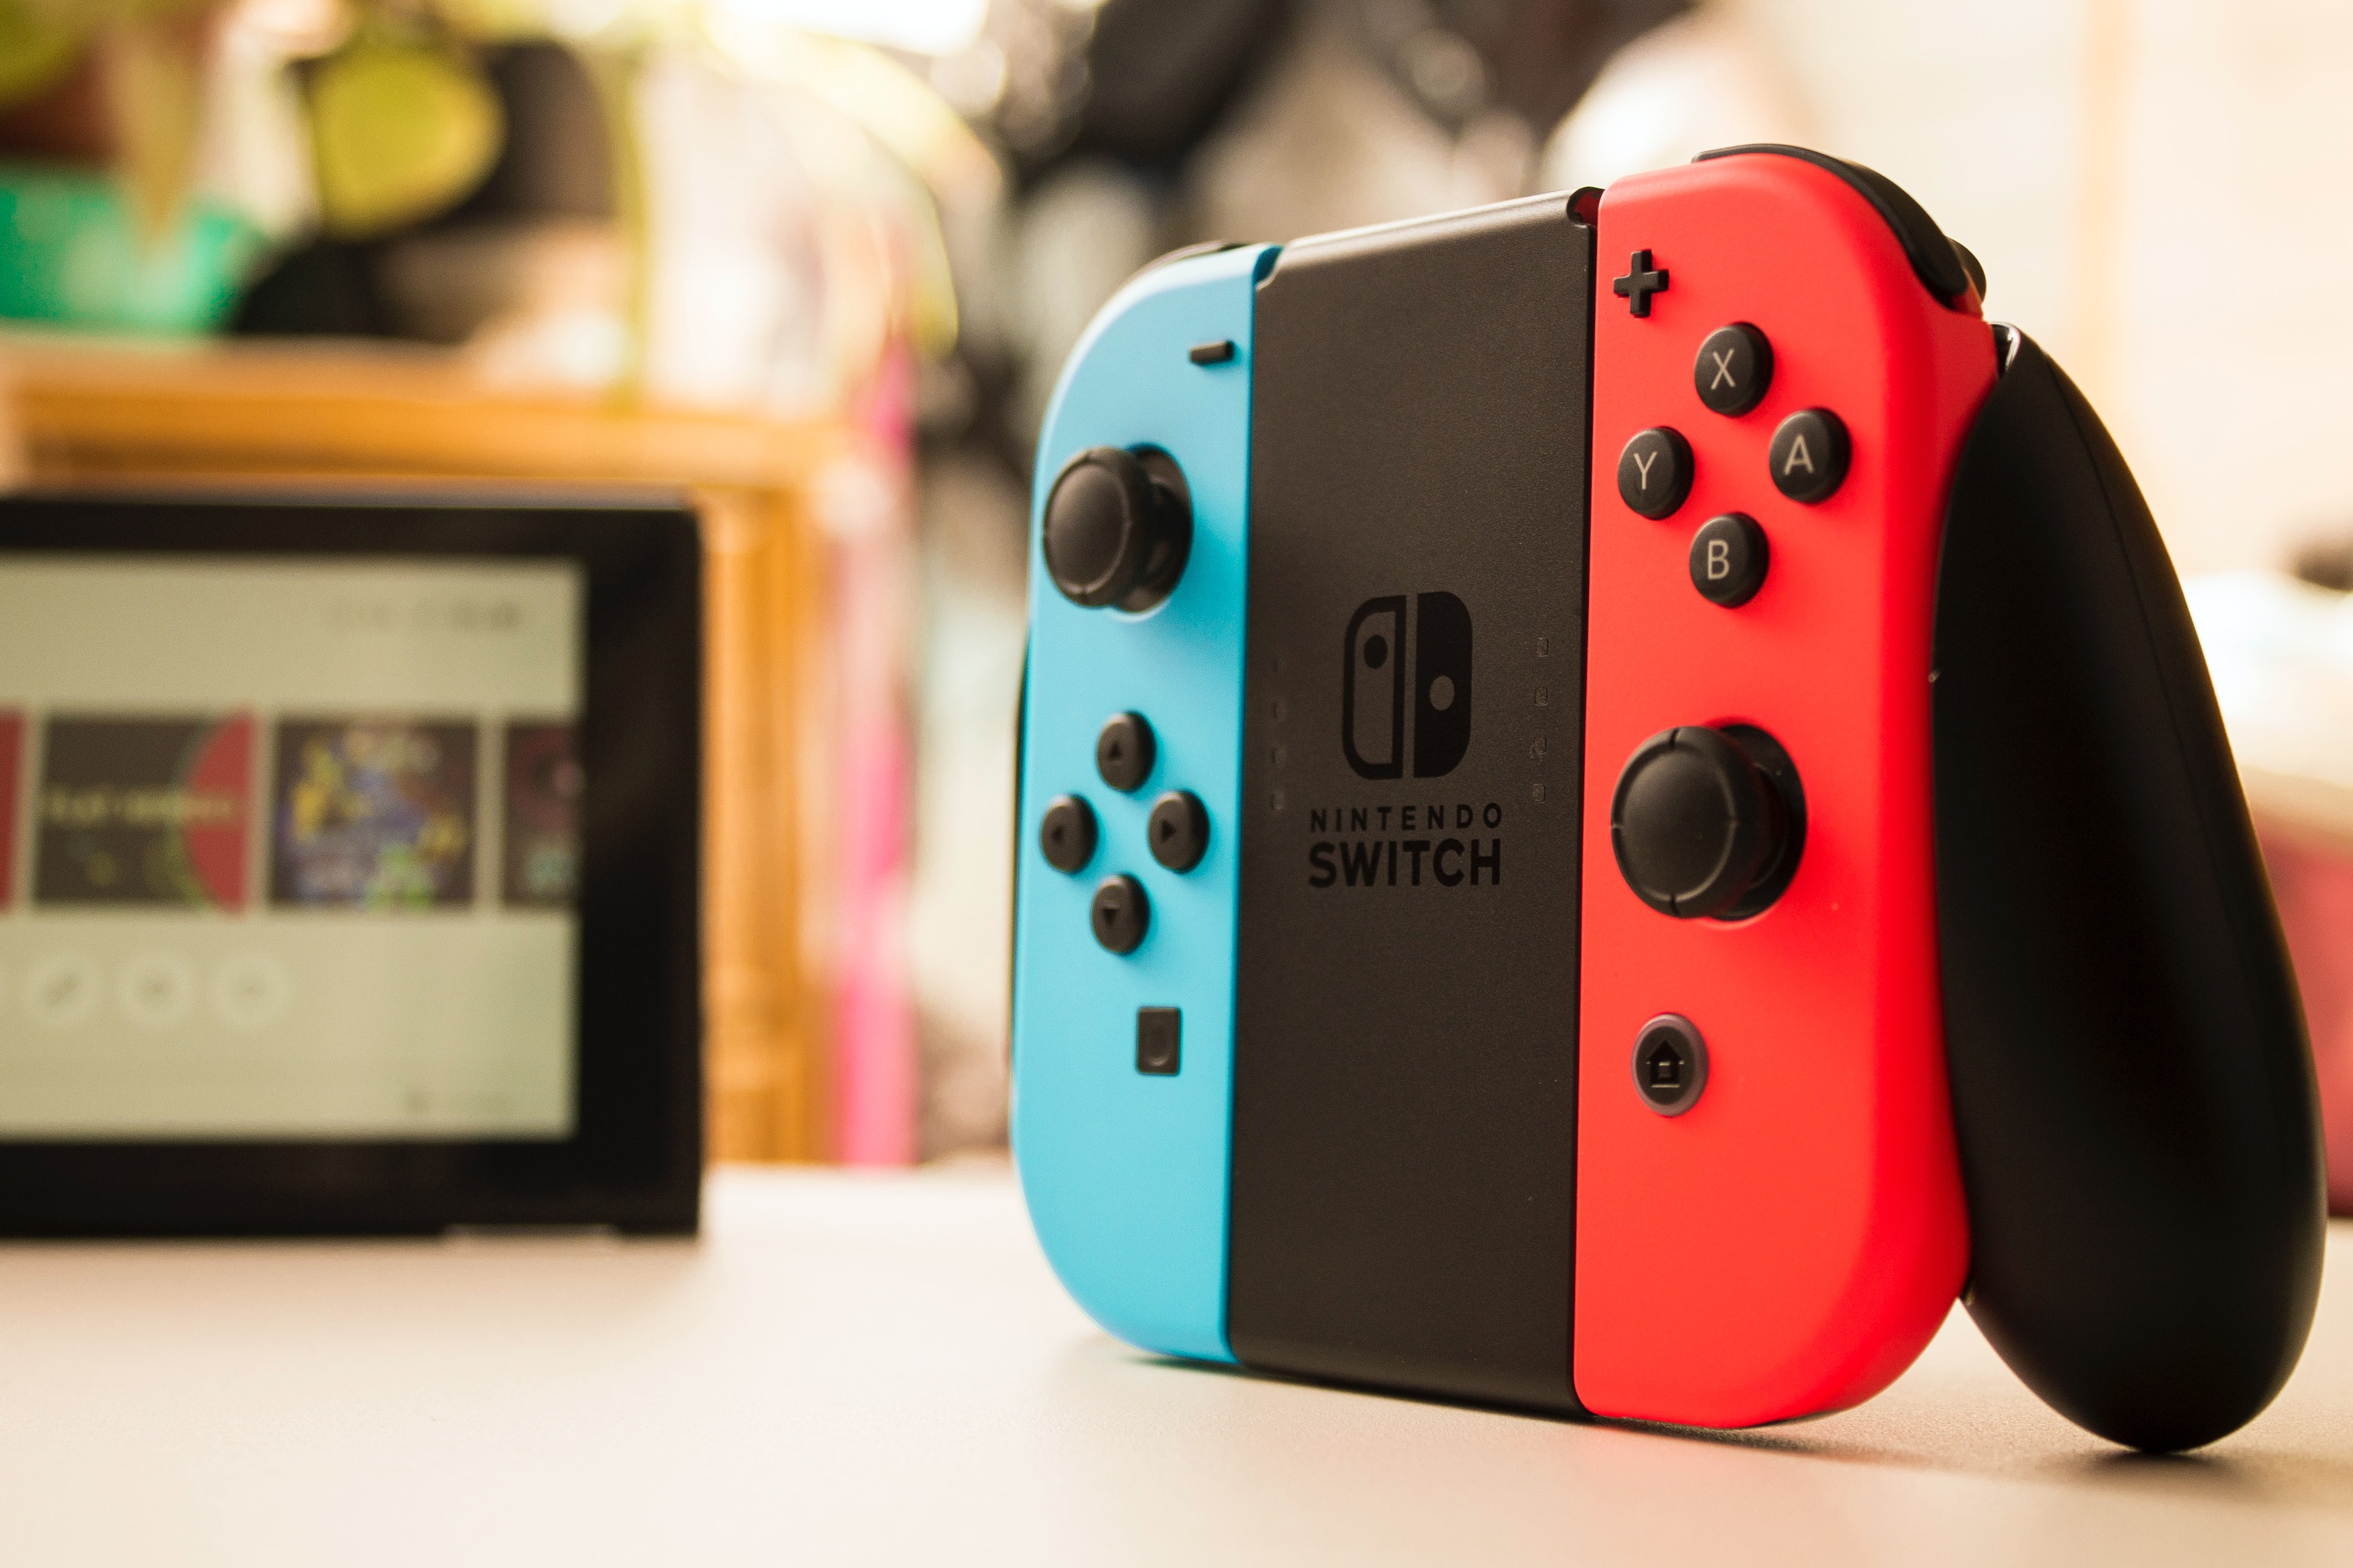 Nintendo Switch E3 2021